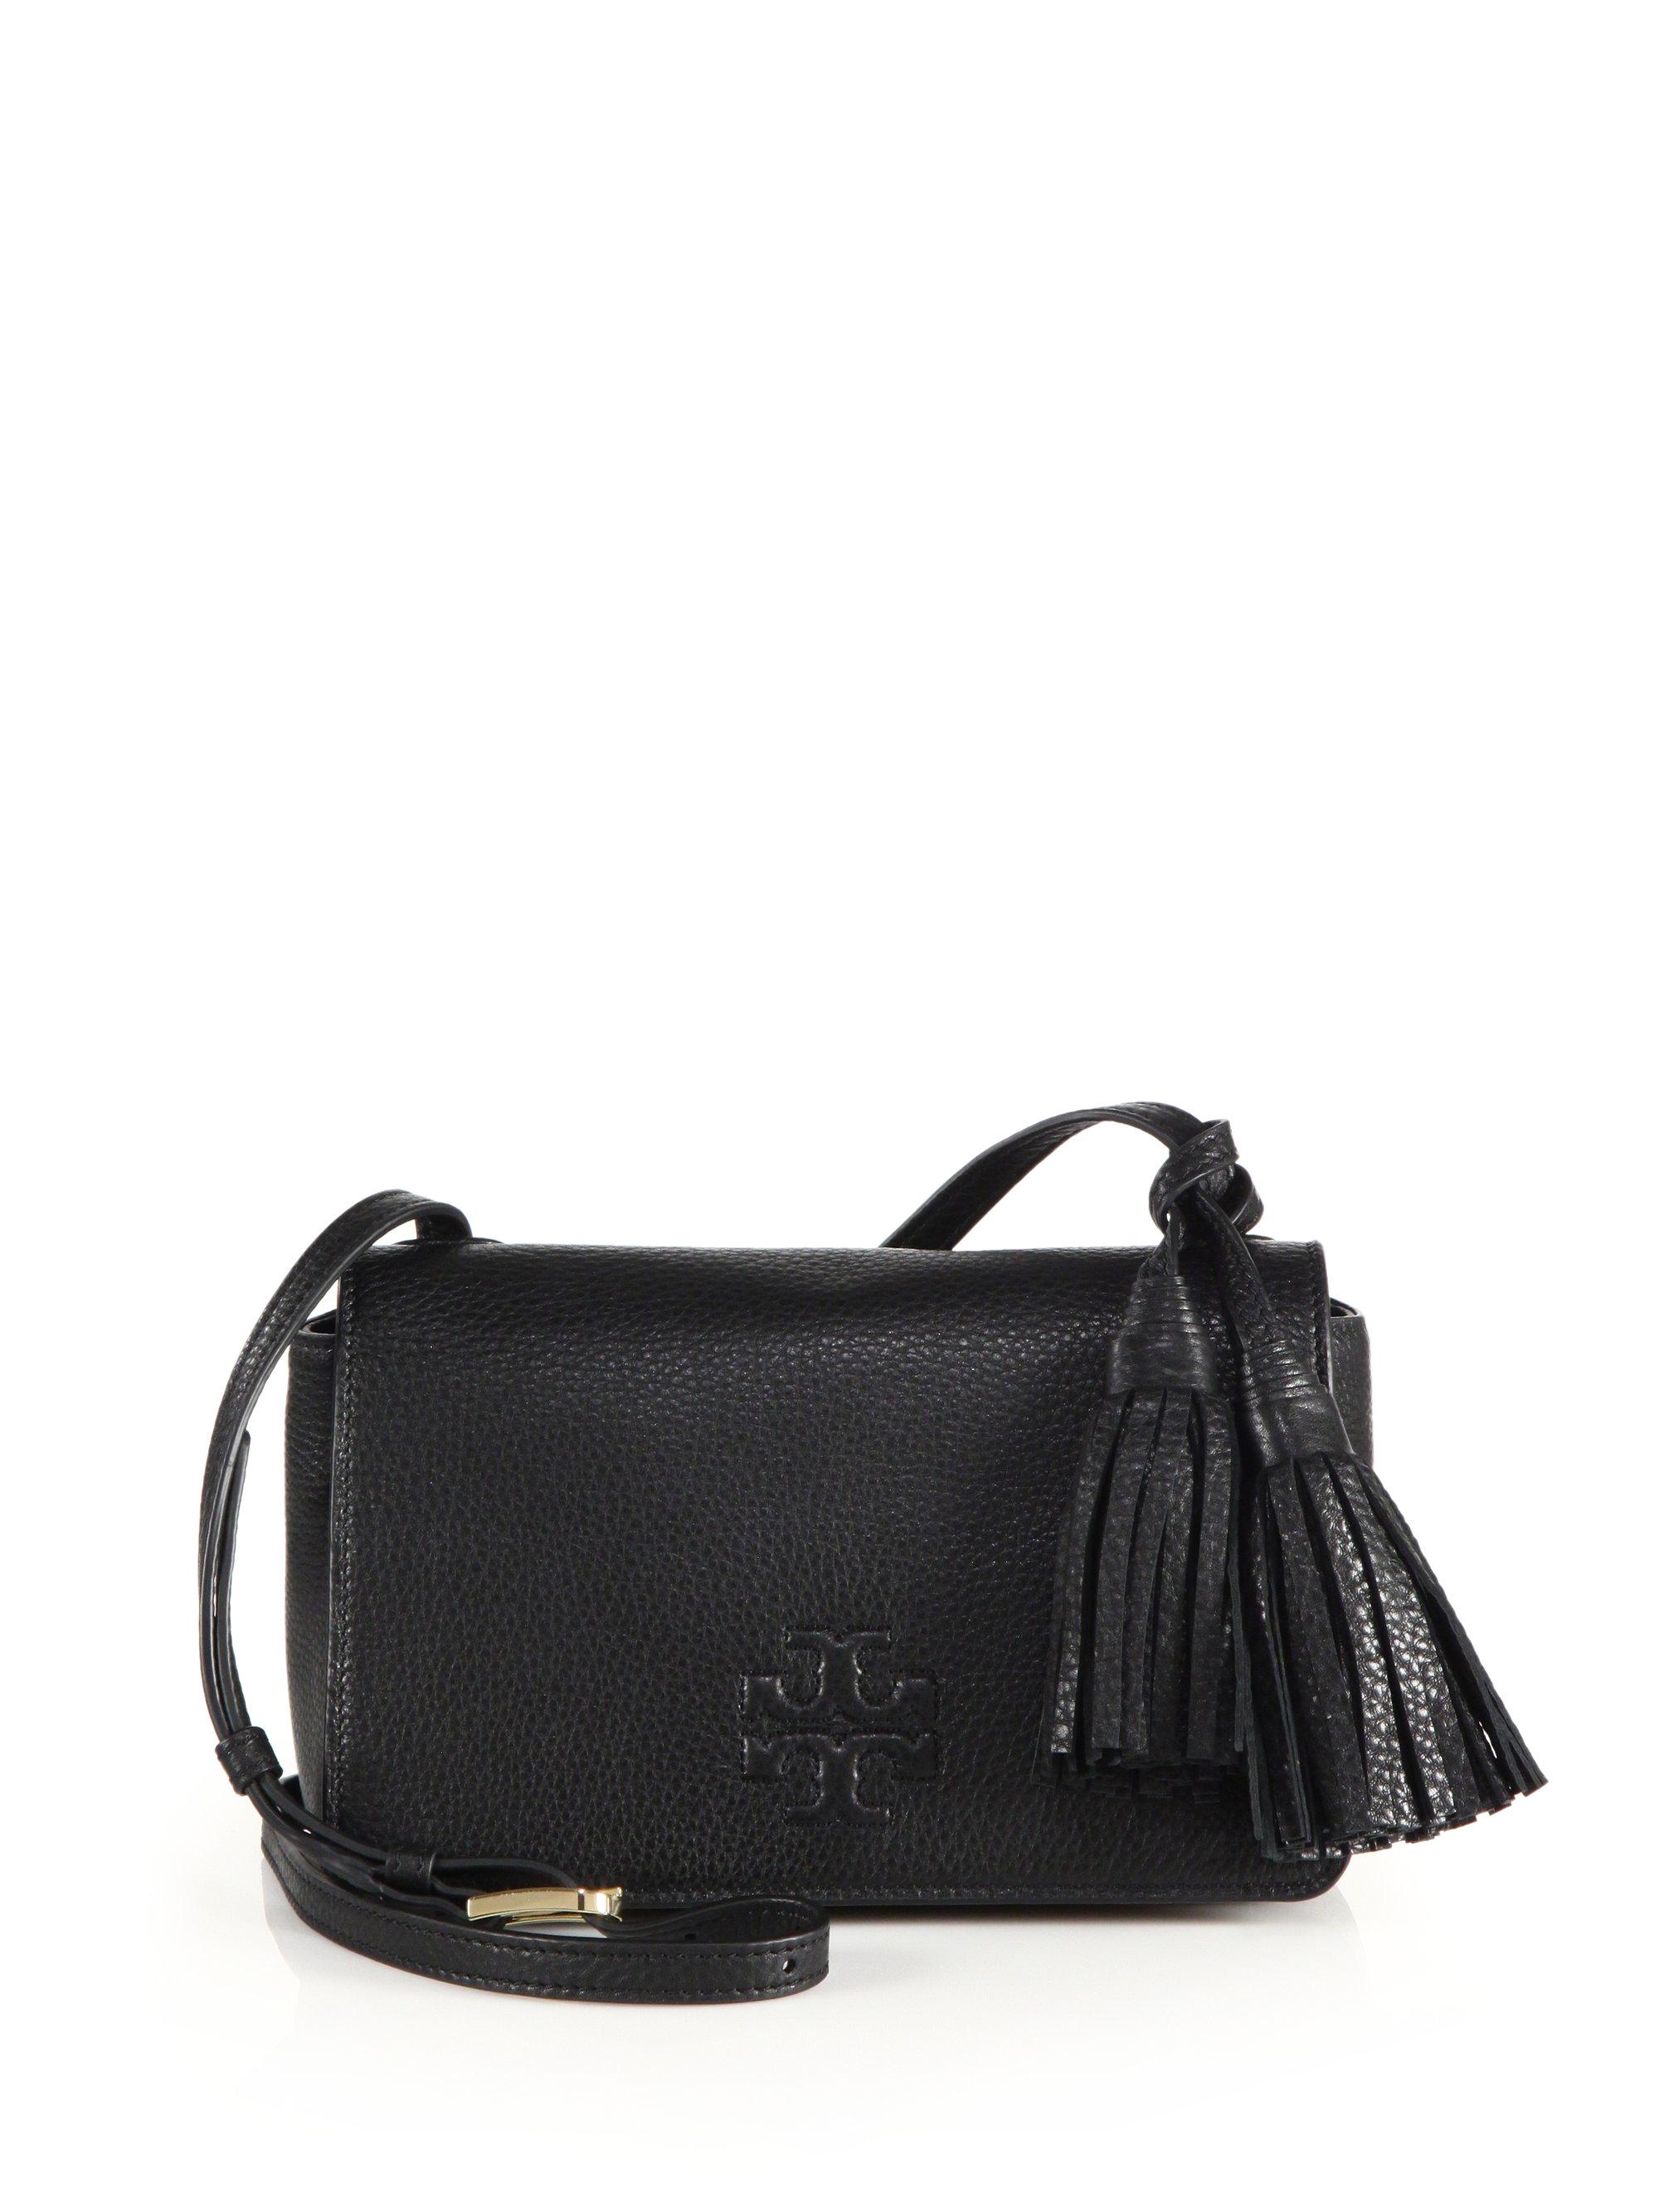 314d779d575a Lyst - Tory Burch Thea Mini Leather Tassel Crossbody Bag in Black